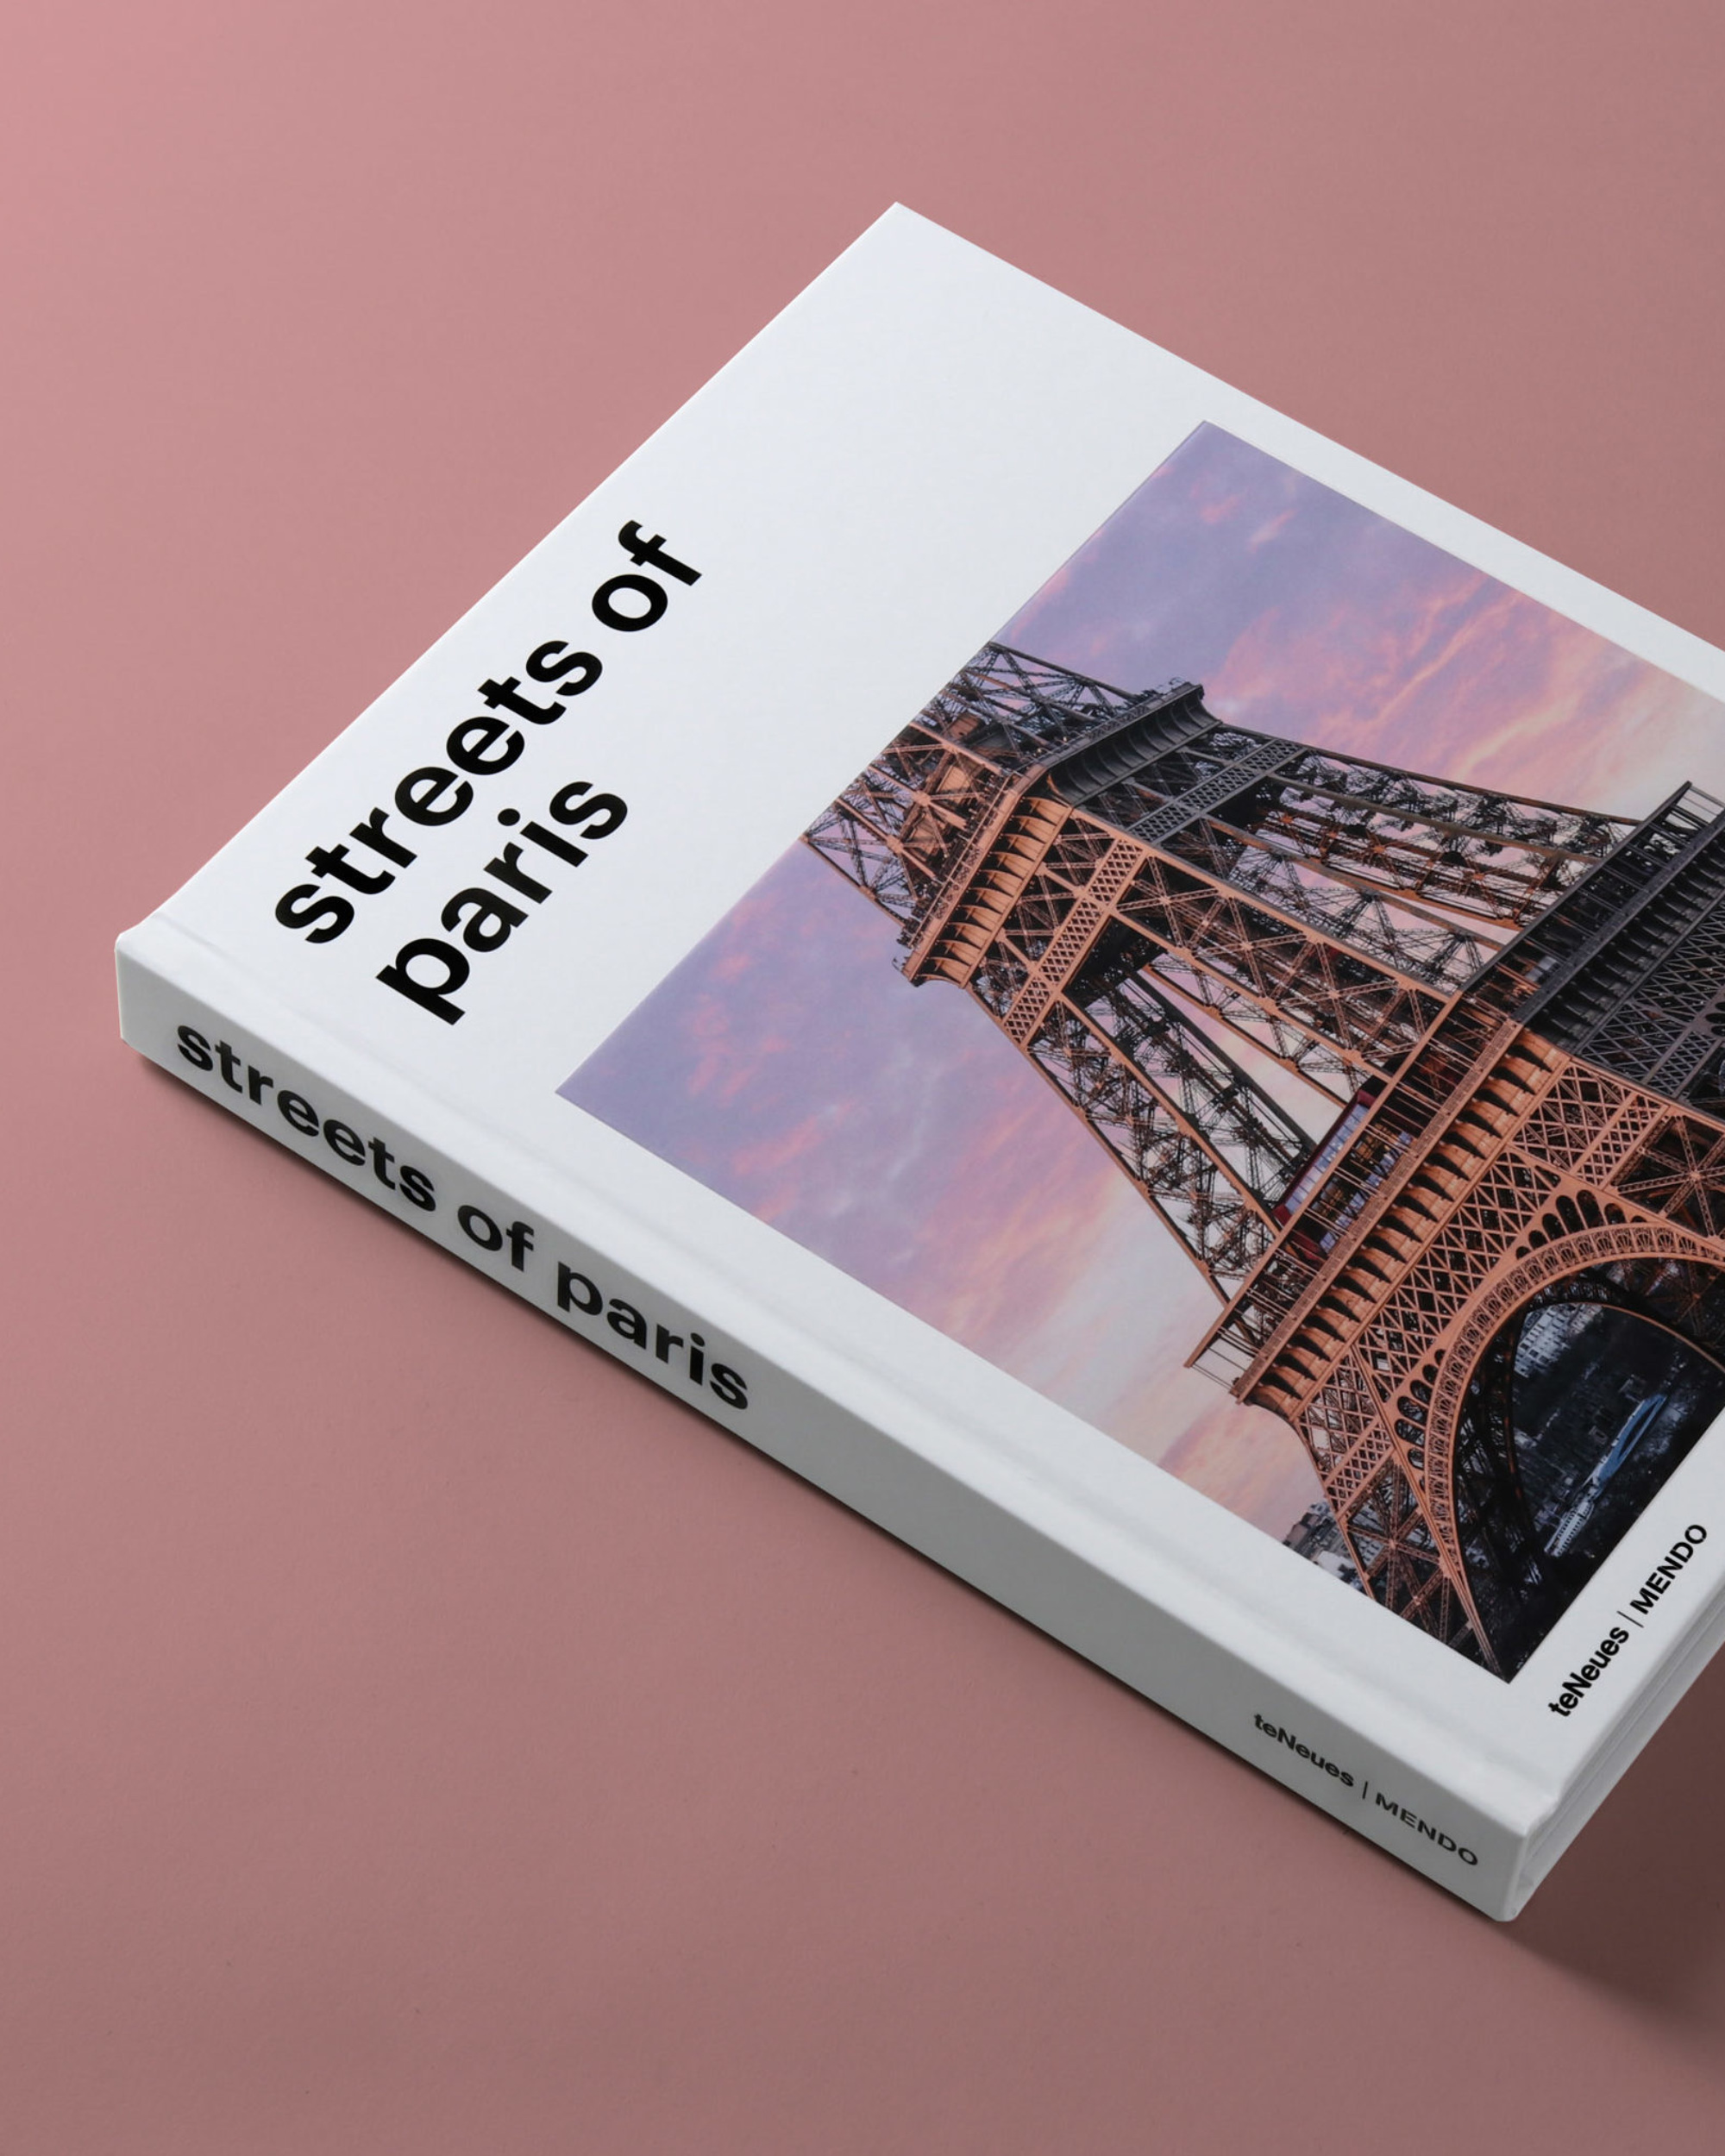 mendo-book-streets-of-paris-studio-23-e1537443460103-2000x2500-c-default.jpg